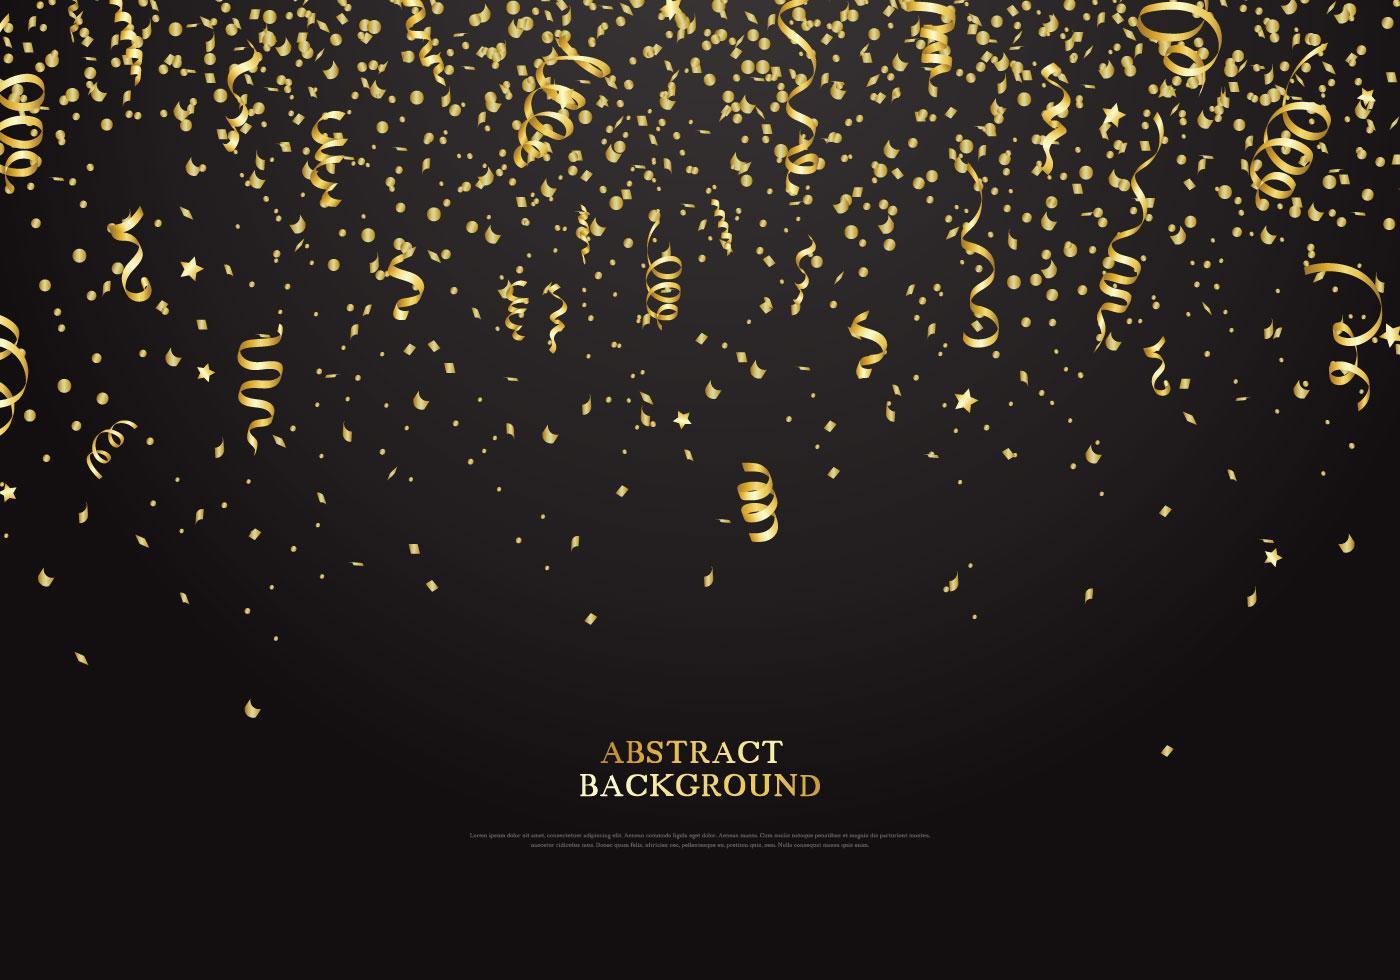 Falling Glitter Confetti Wallpapers Golden Serpentine Background Download Free Vector Art